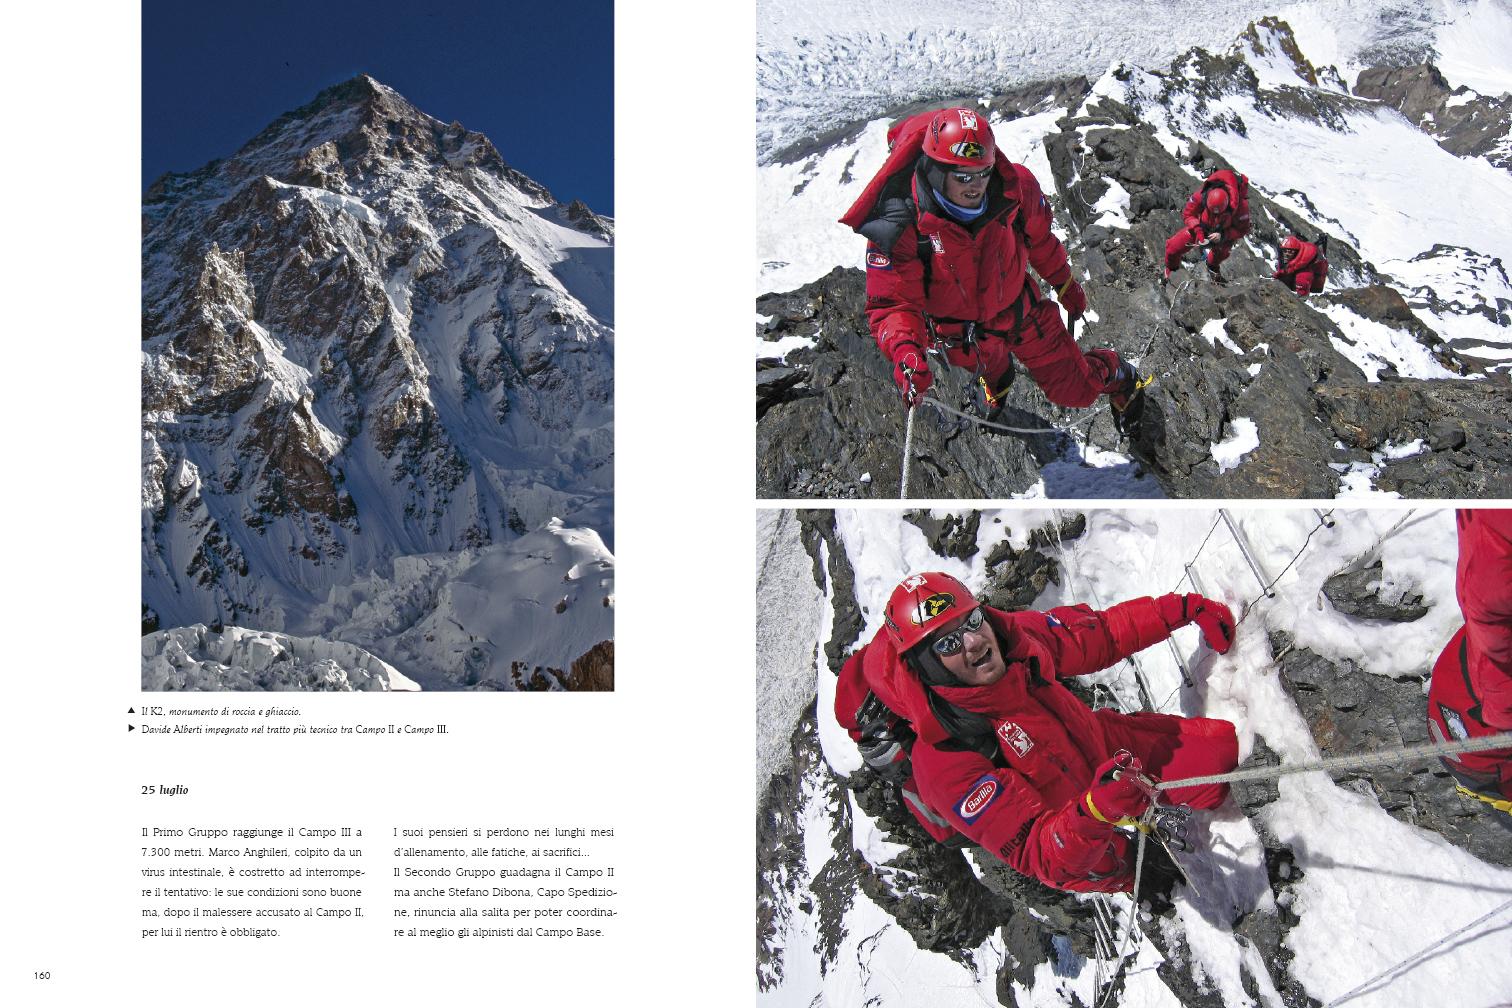 K2 EXPEDITION 1954-2004 Giuseppe Ghedina Fotografo - 082.jpg